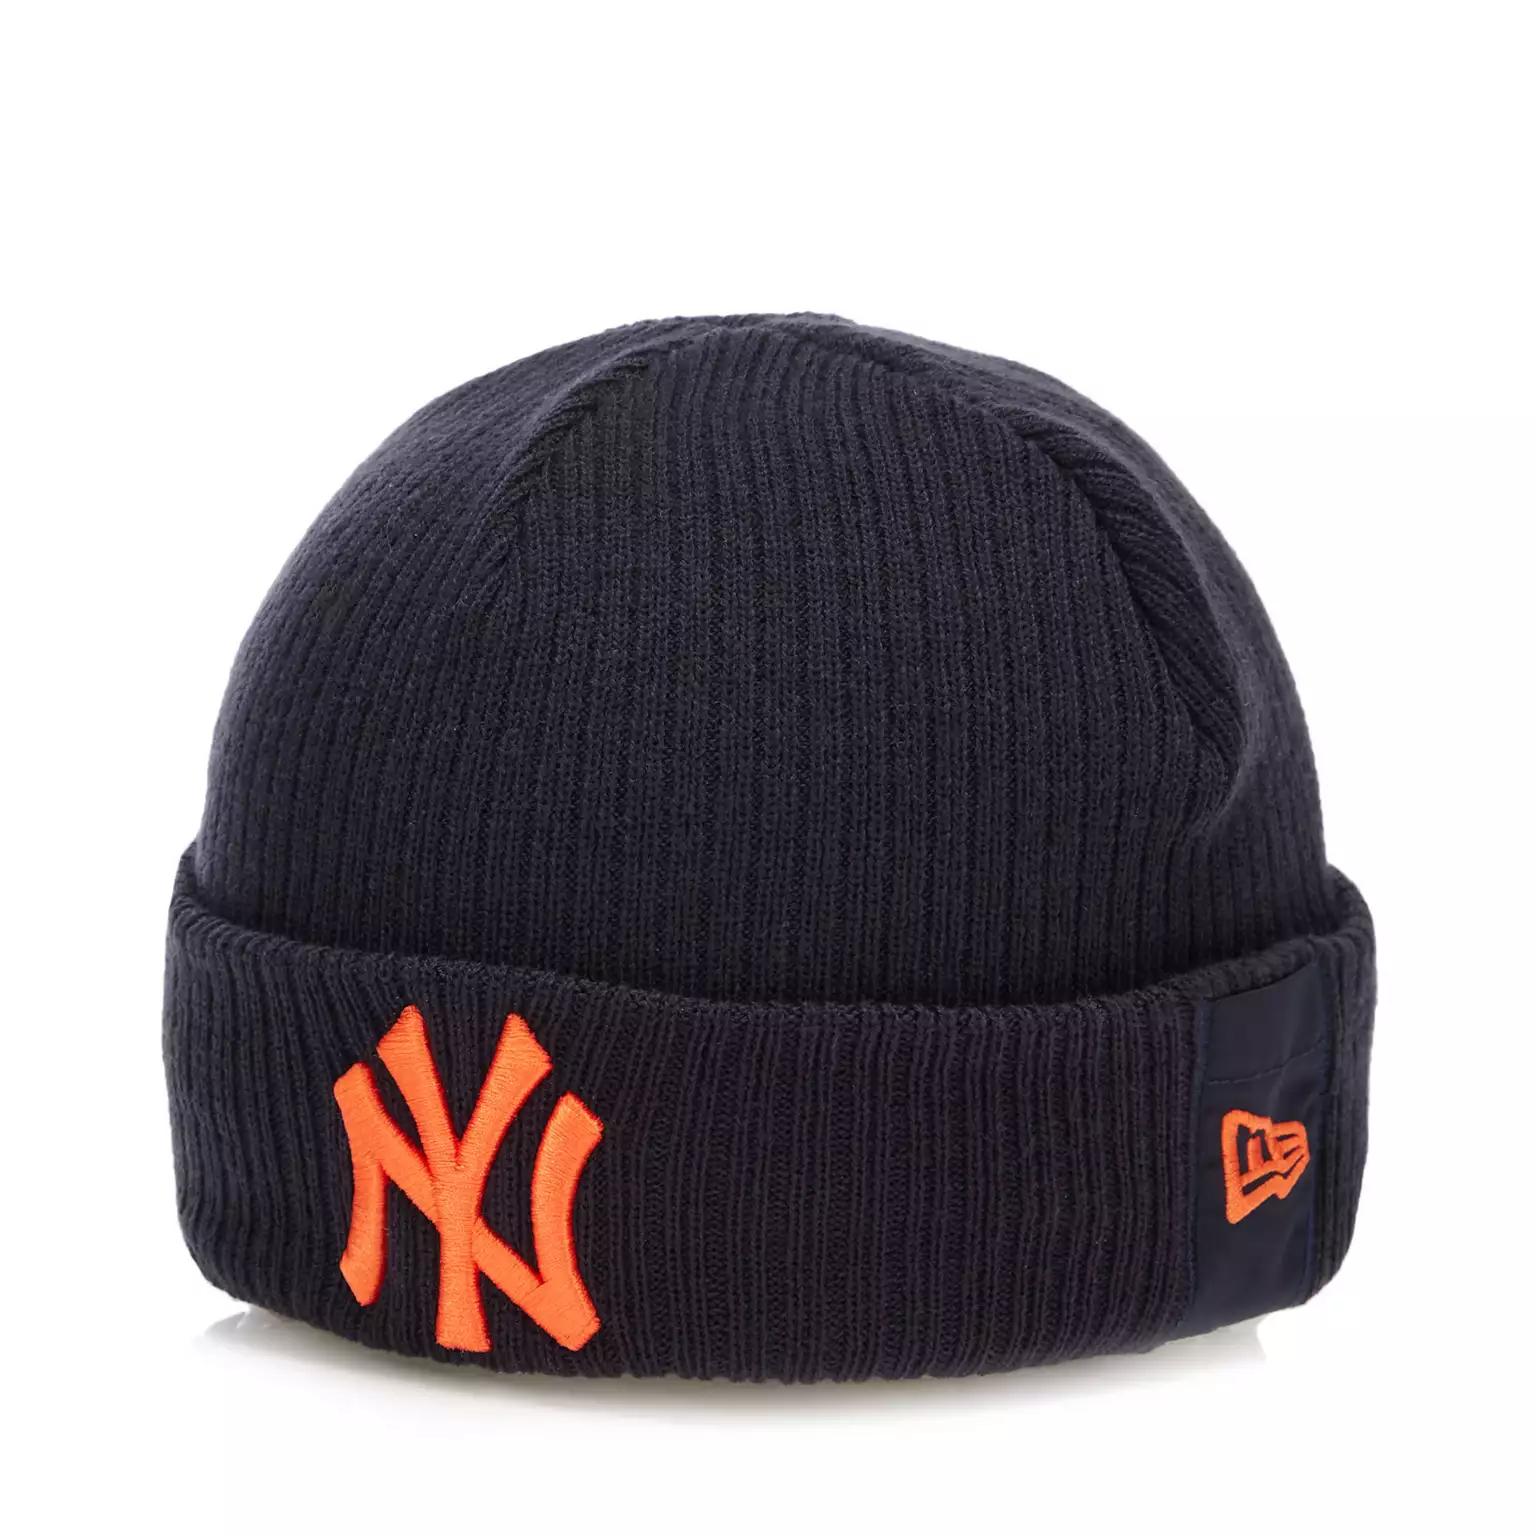 New Era - Navy New York Yankees Logo Beanie £7.80 at Debenhams (Free delivery with code)